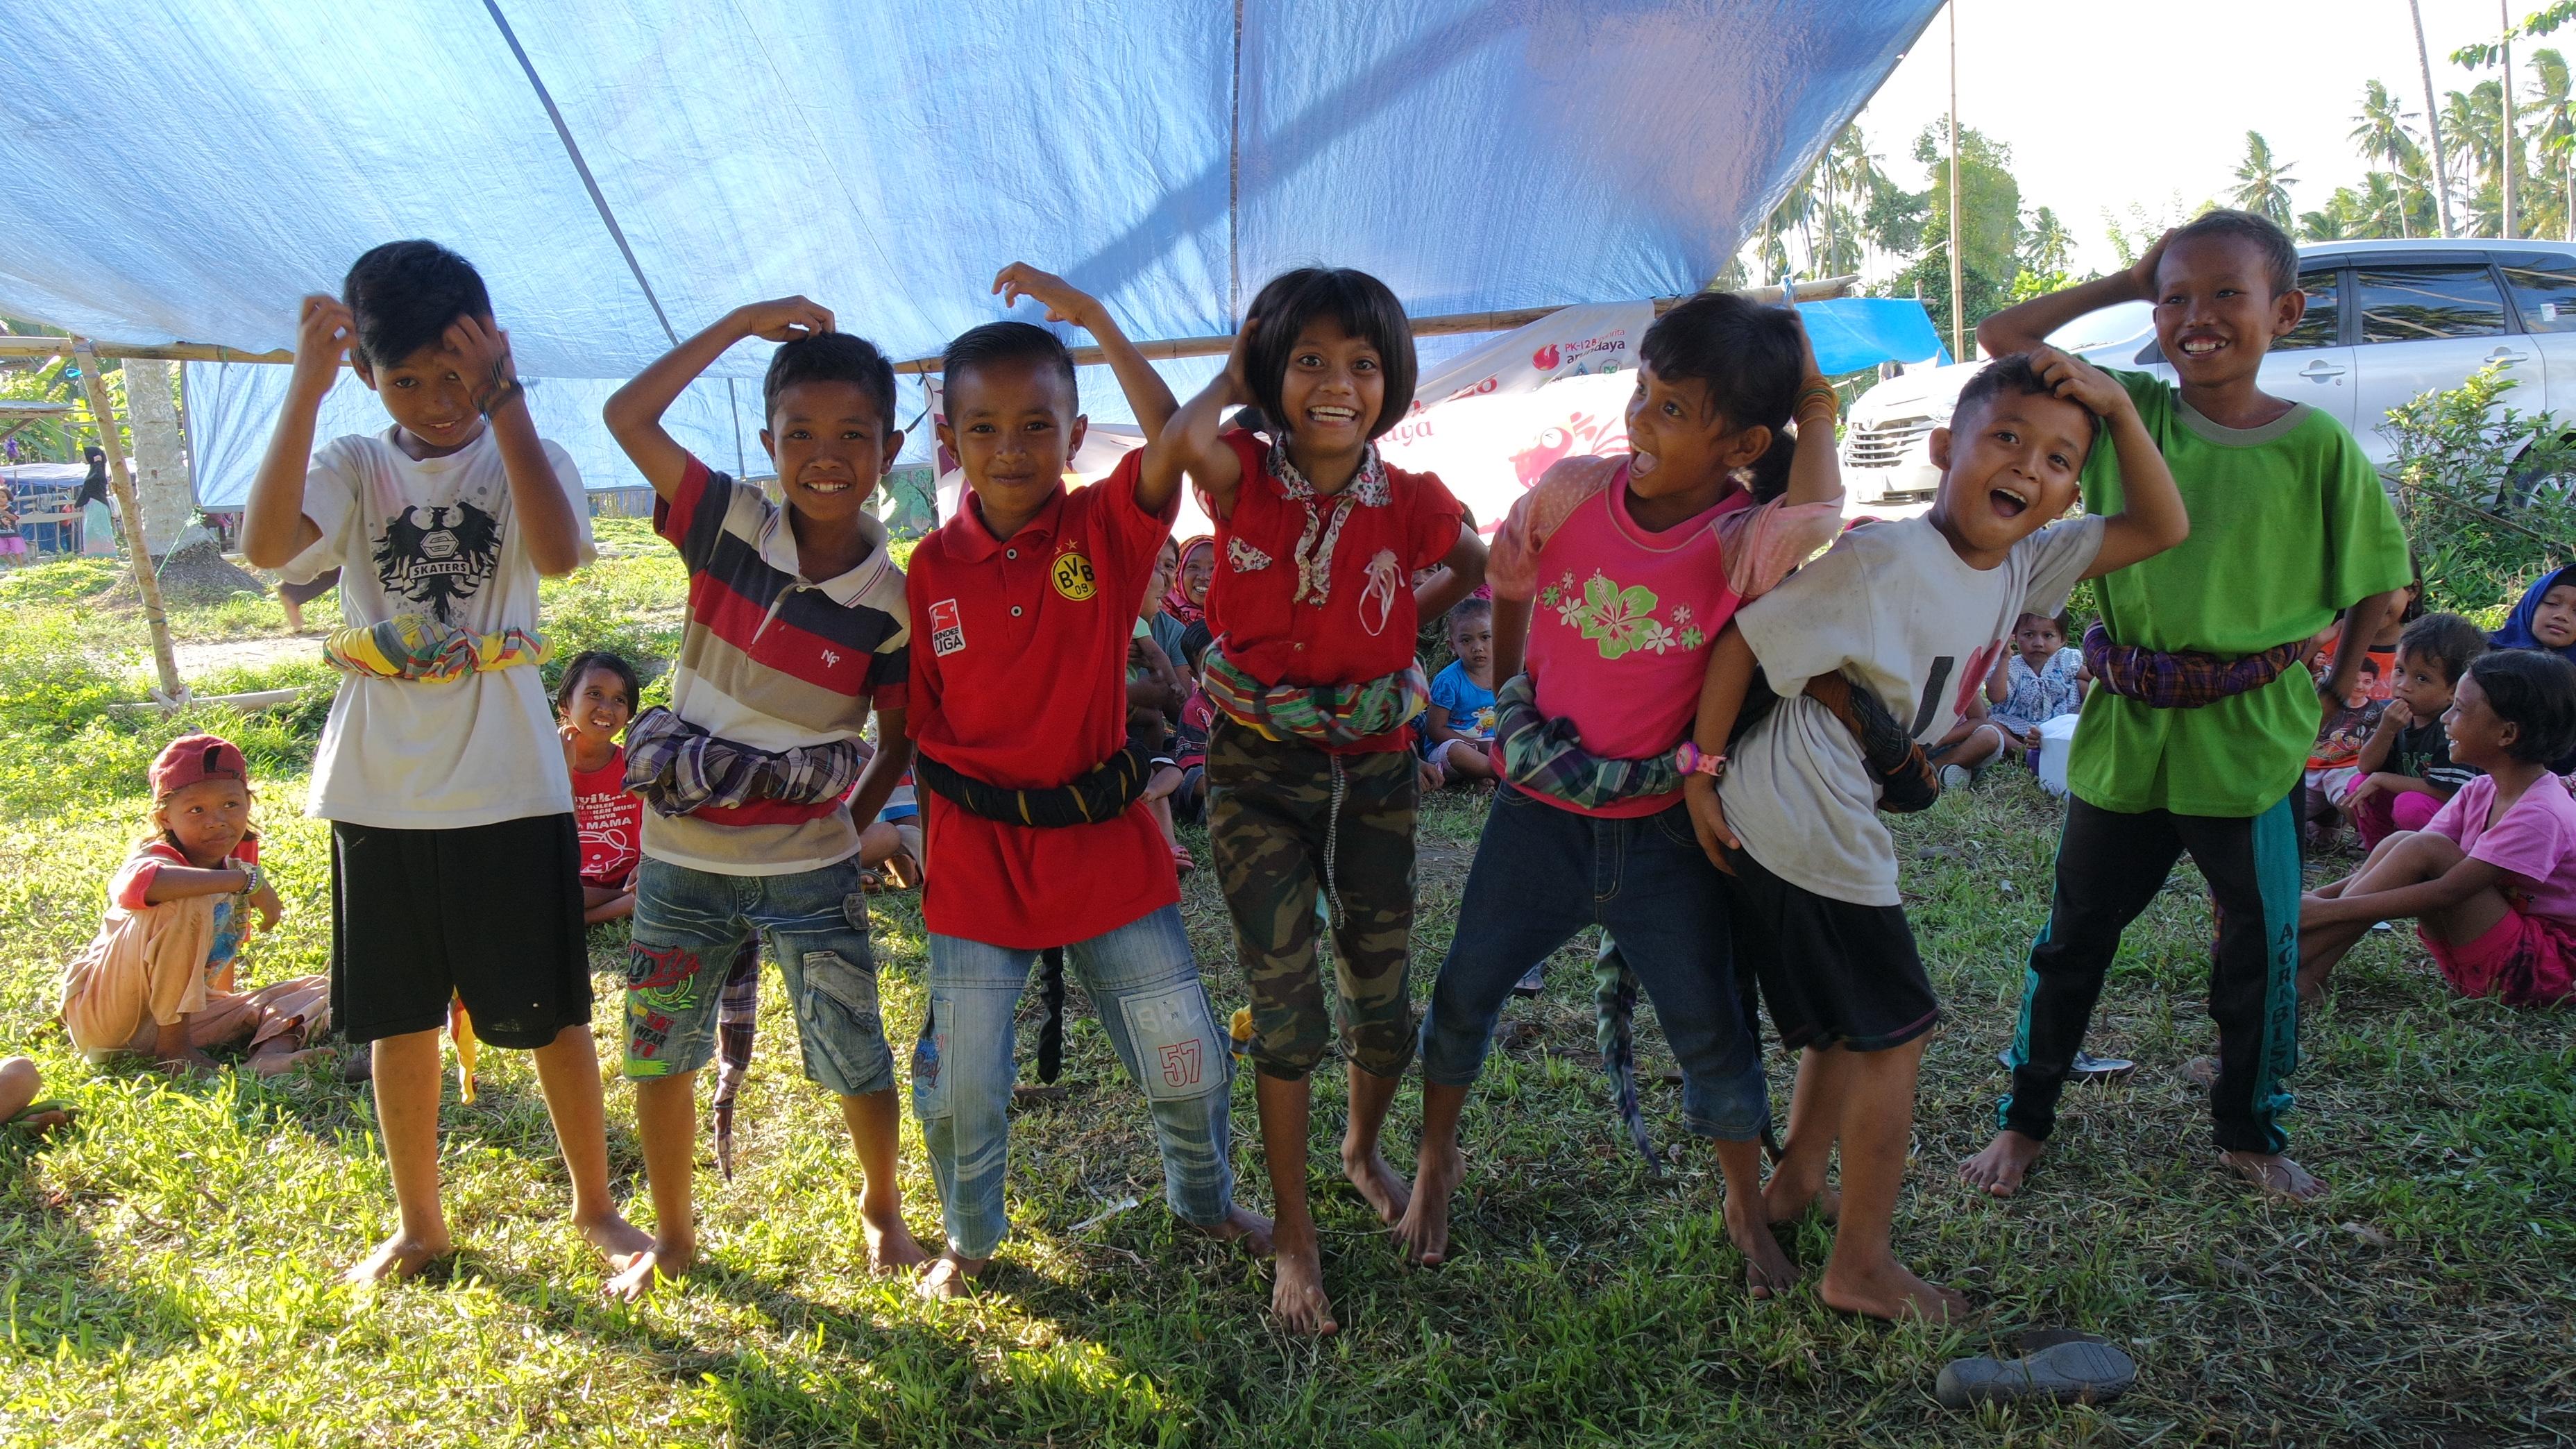 Keceriaan para aak - anak dalam mengikuti kegiatan di Posko Pengungsian (©Panrita Arundaya)